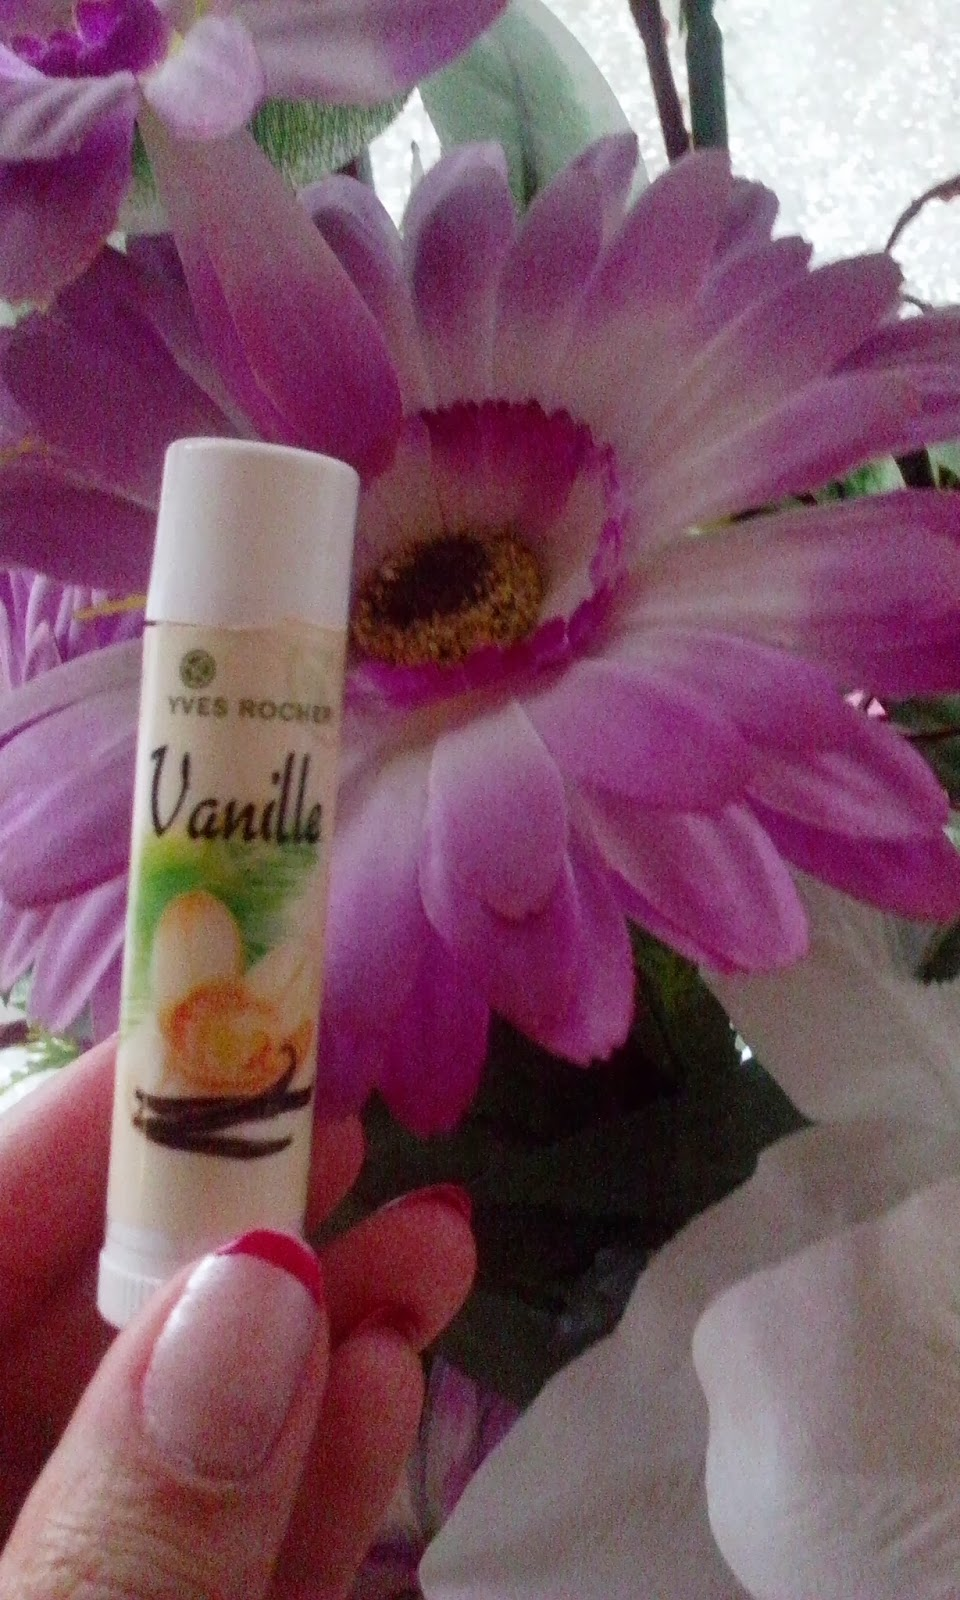 yves rocher vanilyalı lip balm